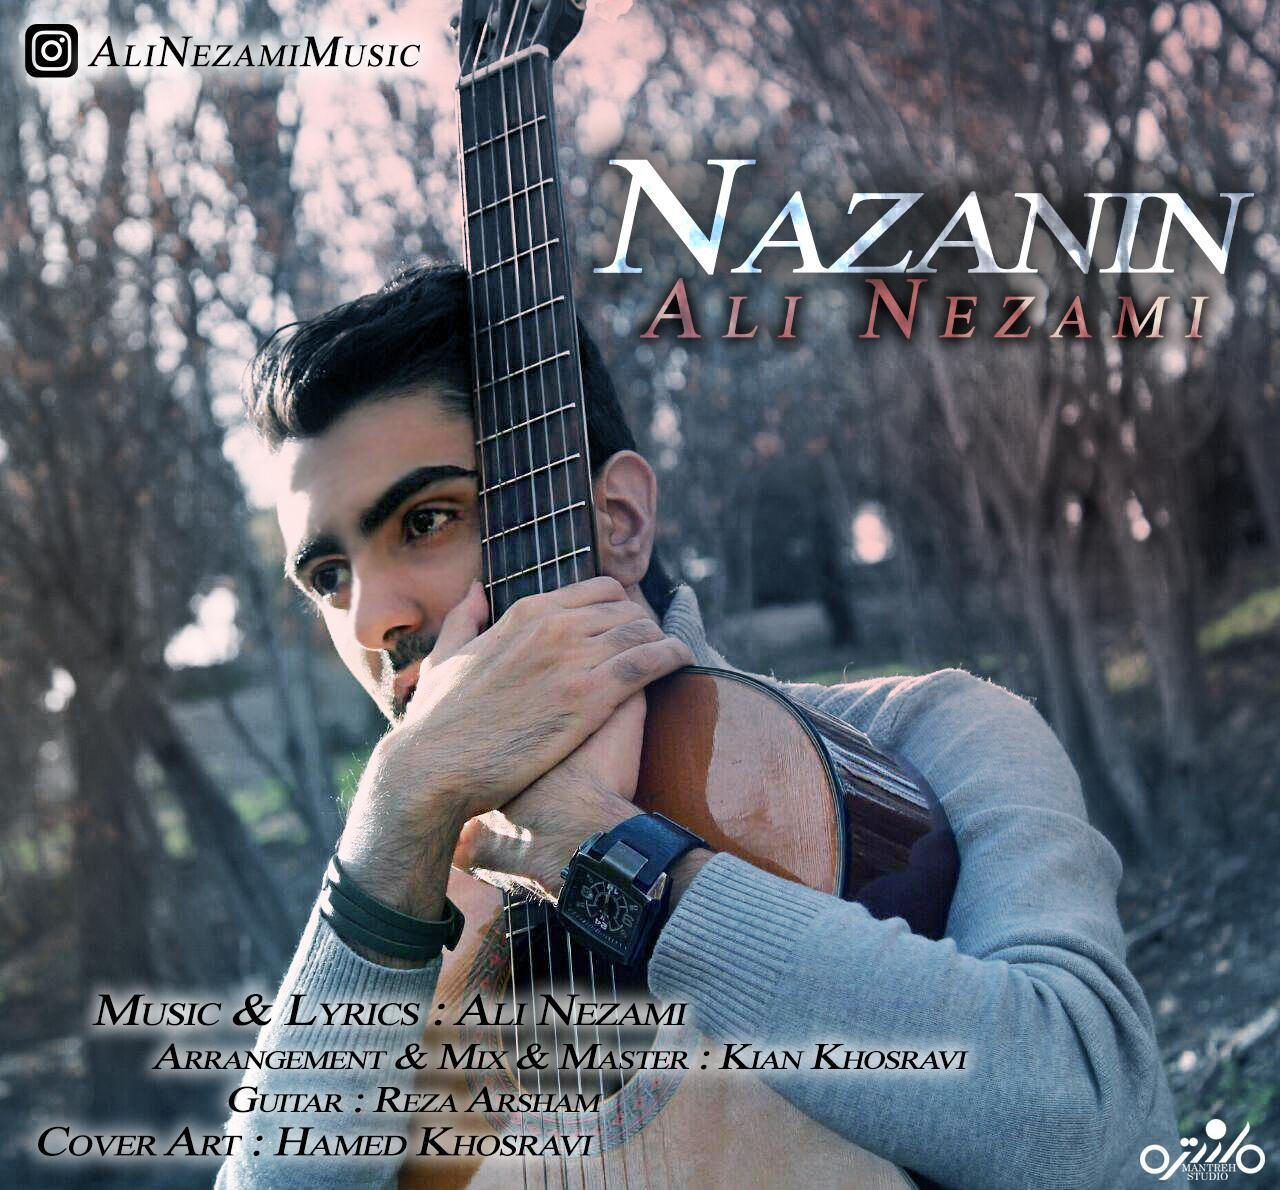 Ali Nezami – Nazanin